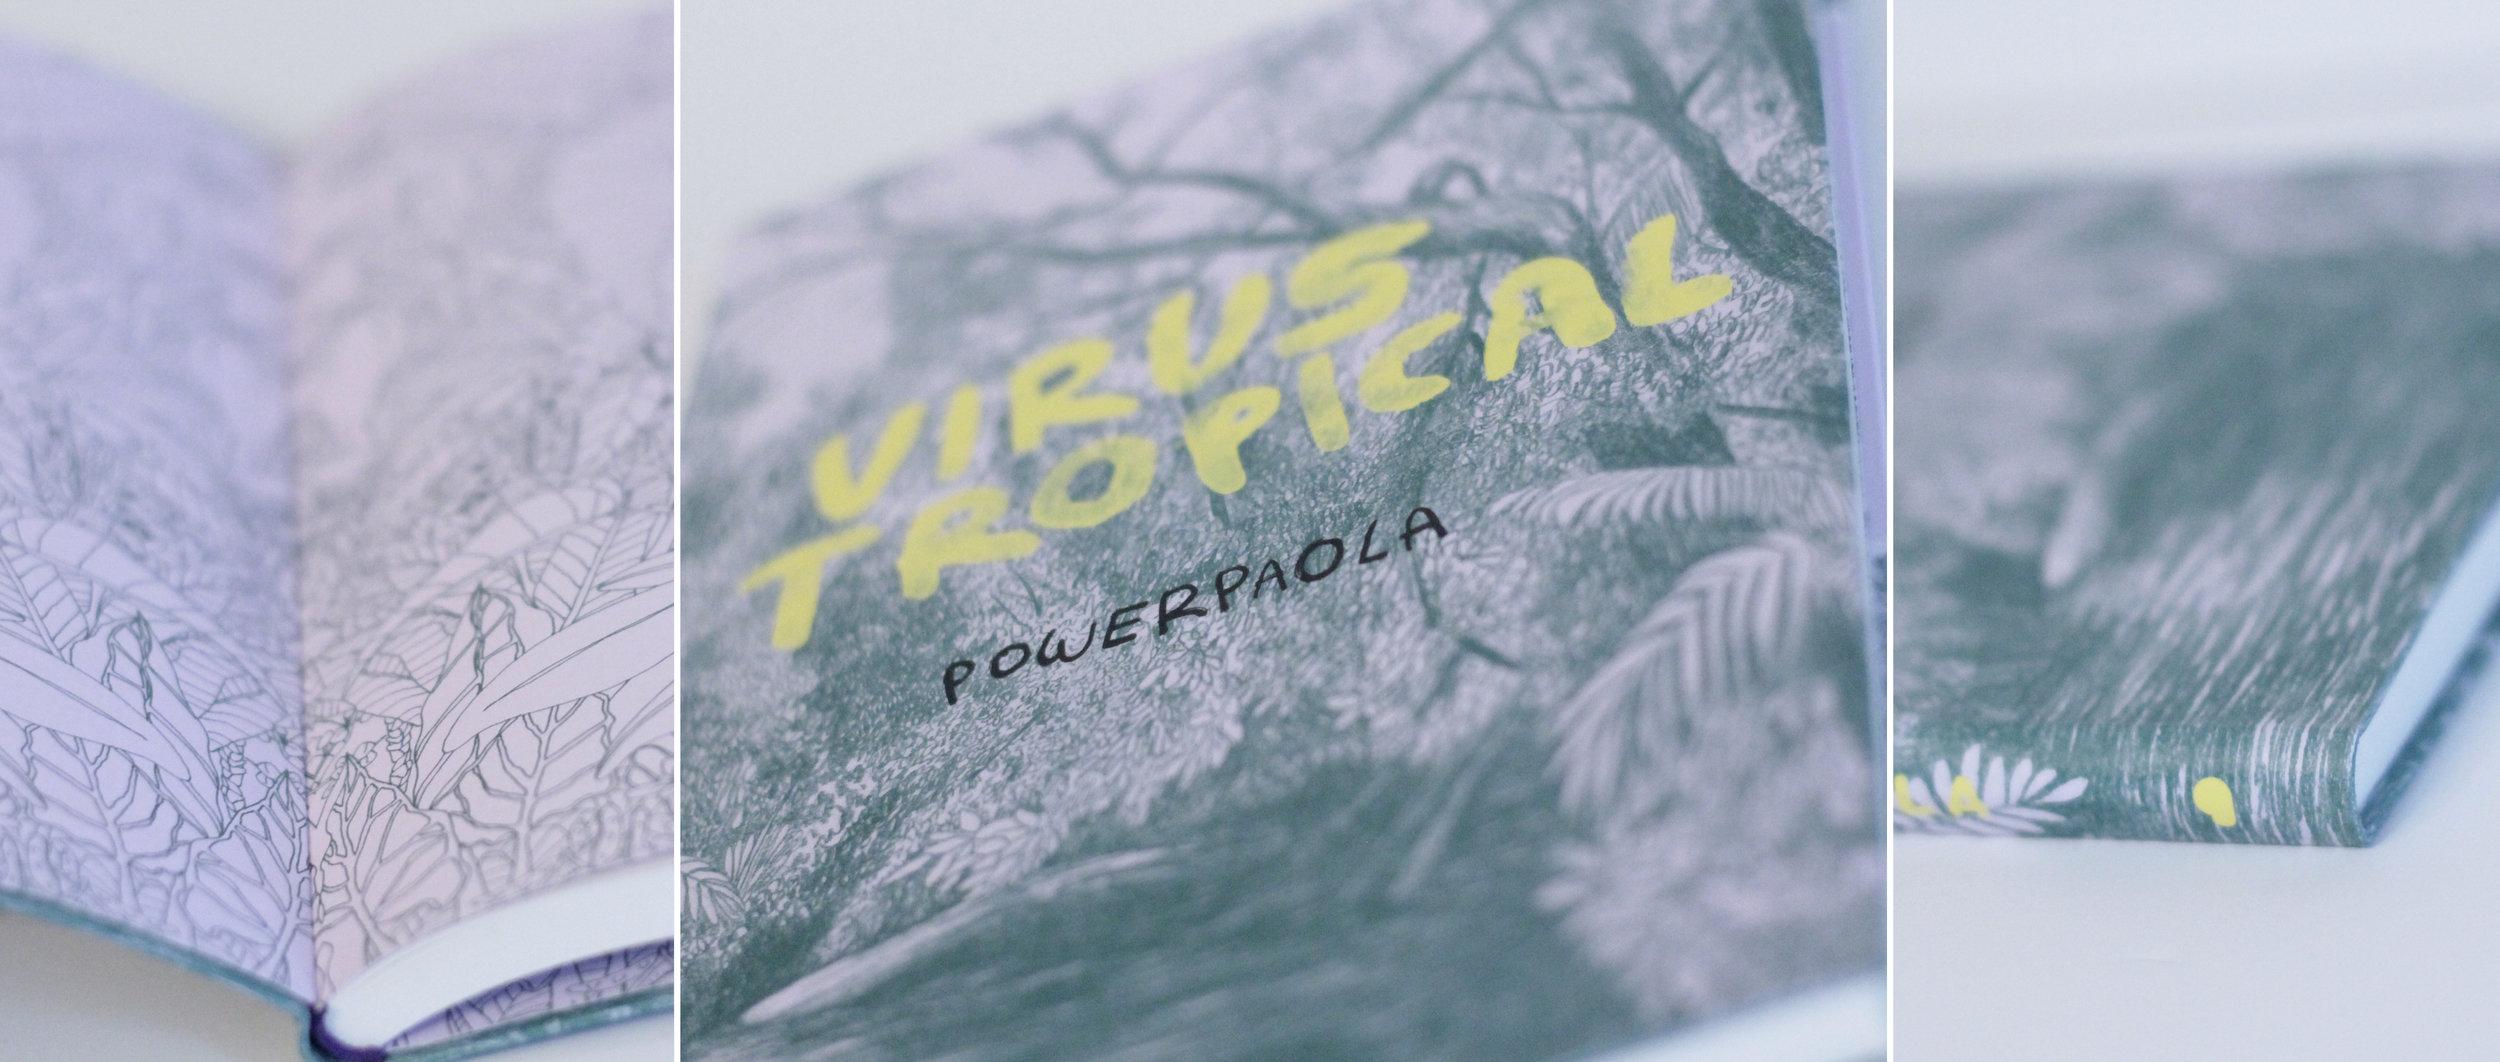 Virus Tropical | Powerpaola